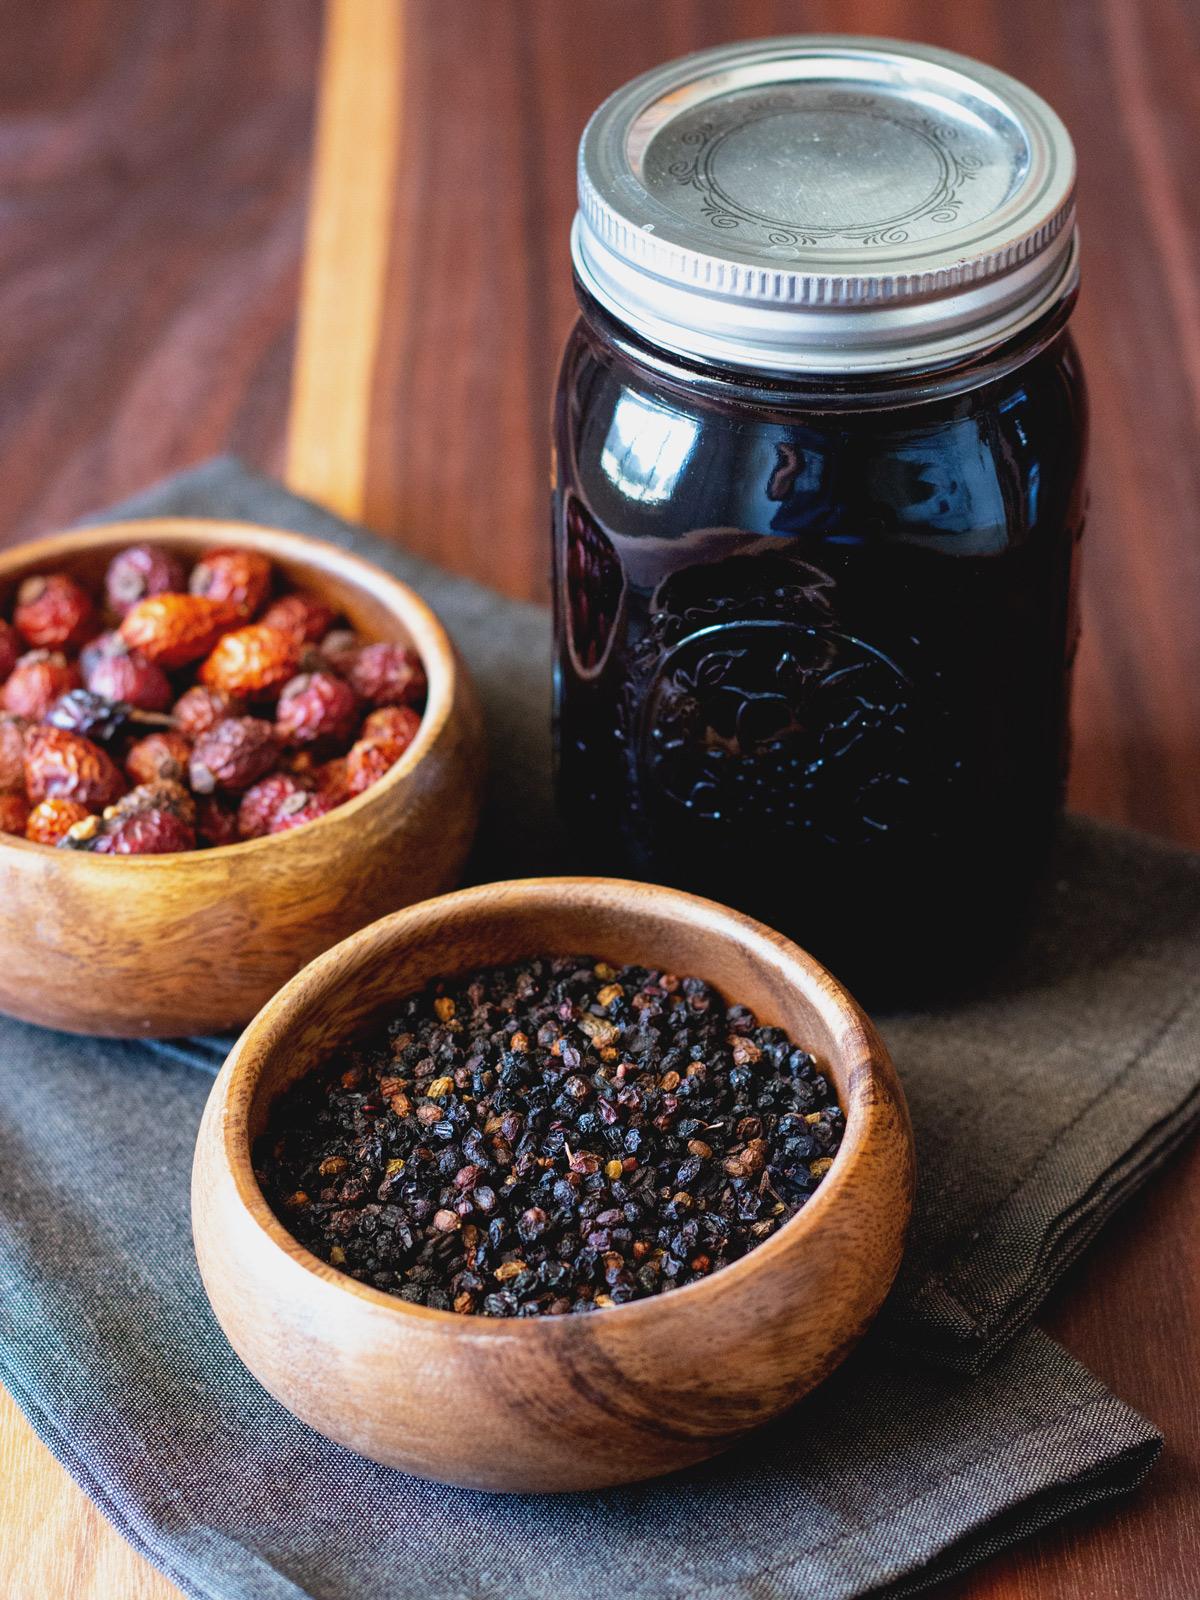 How to Make Homemade Elderberry Syrup